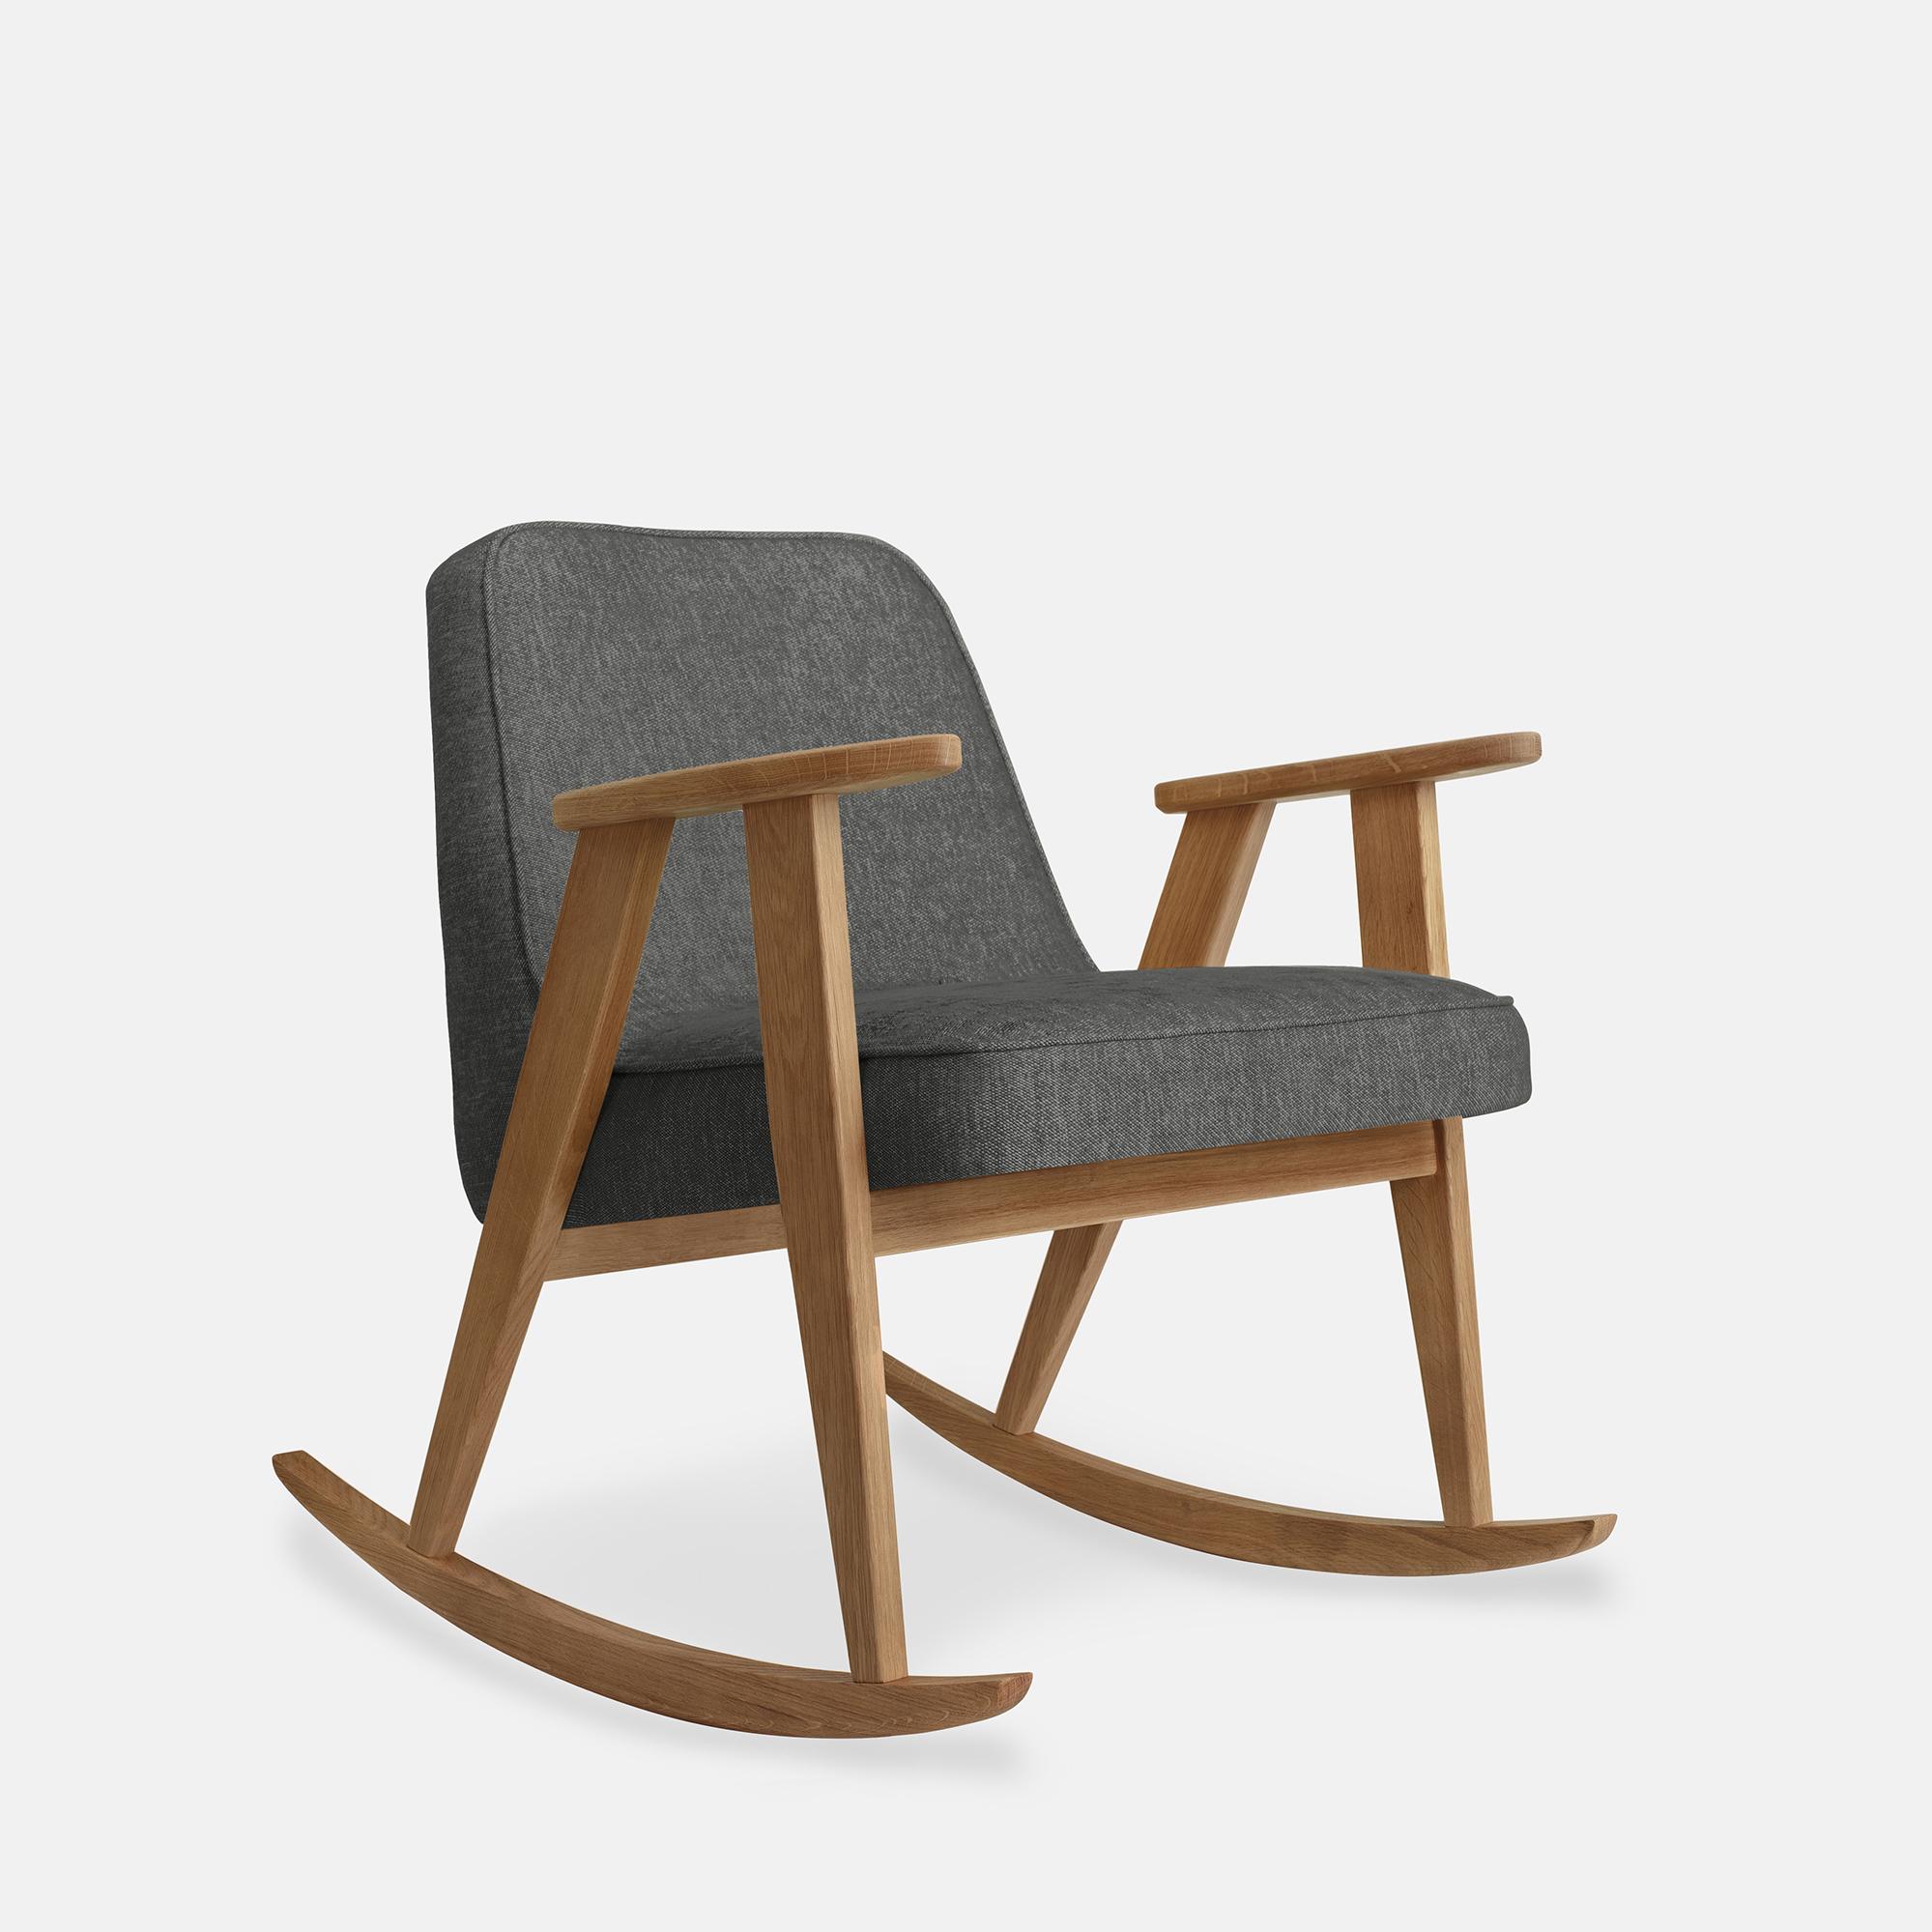 366-Concept-366-Rocking-Chair-W02-Loft-Grey